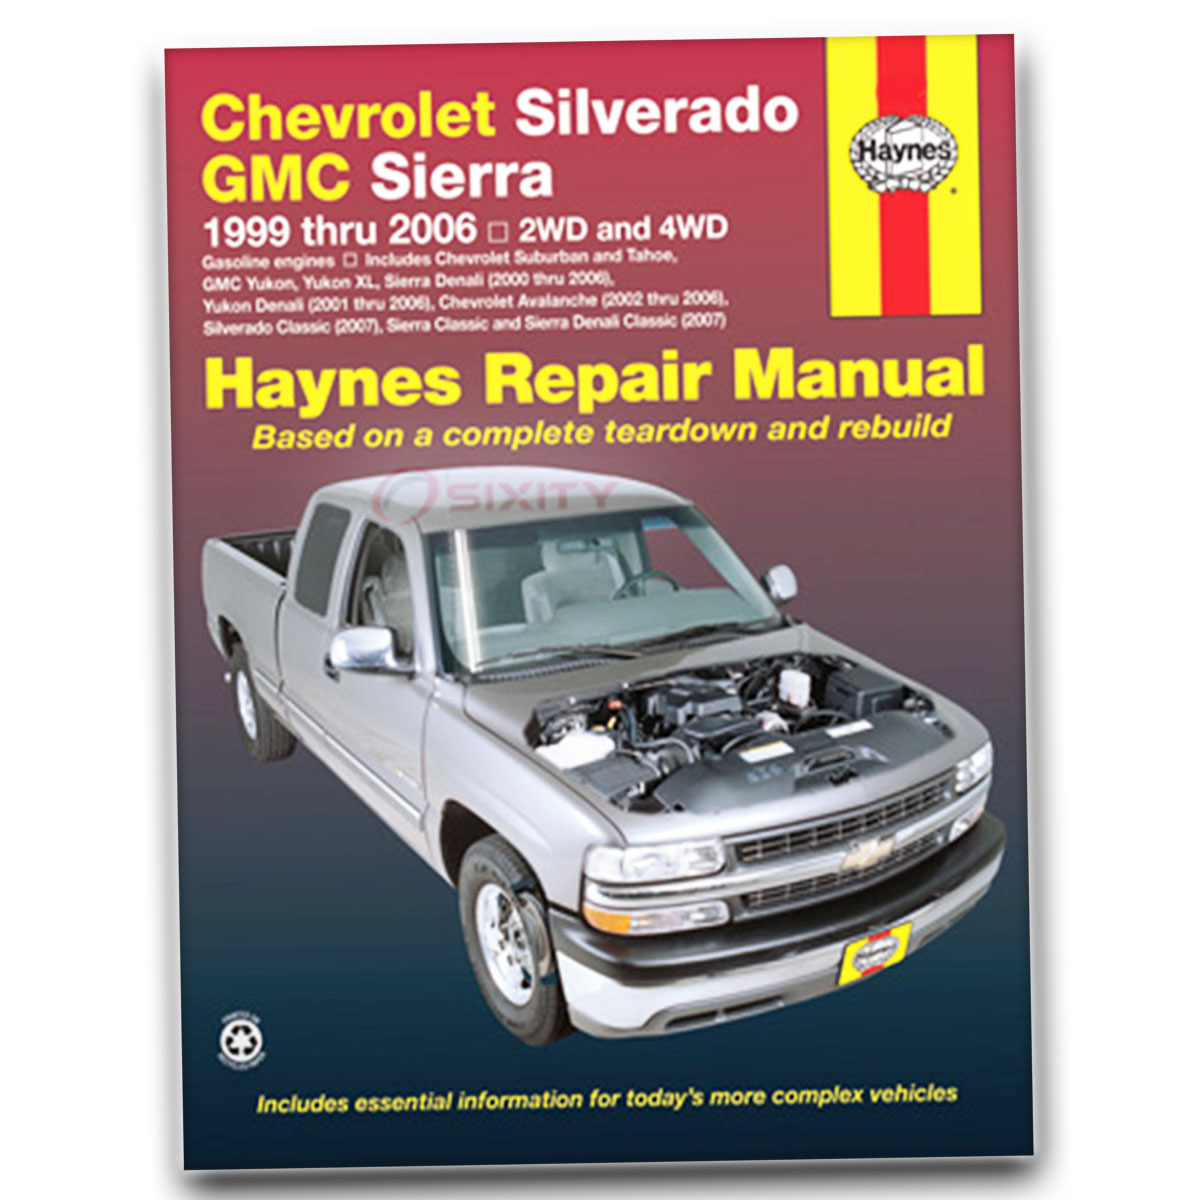 Chevy Silverado 1500 Hd Haynes Repair Manual Lt Base Ls